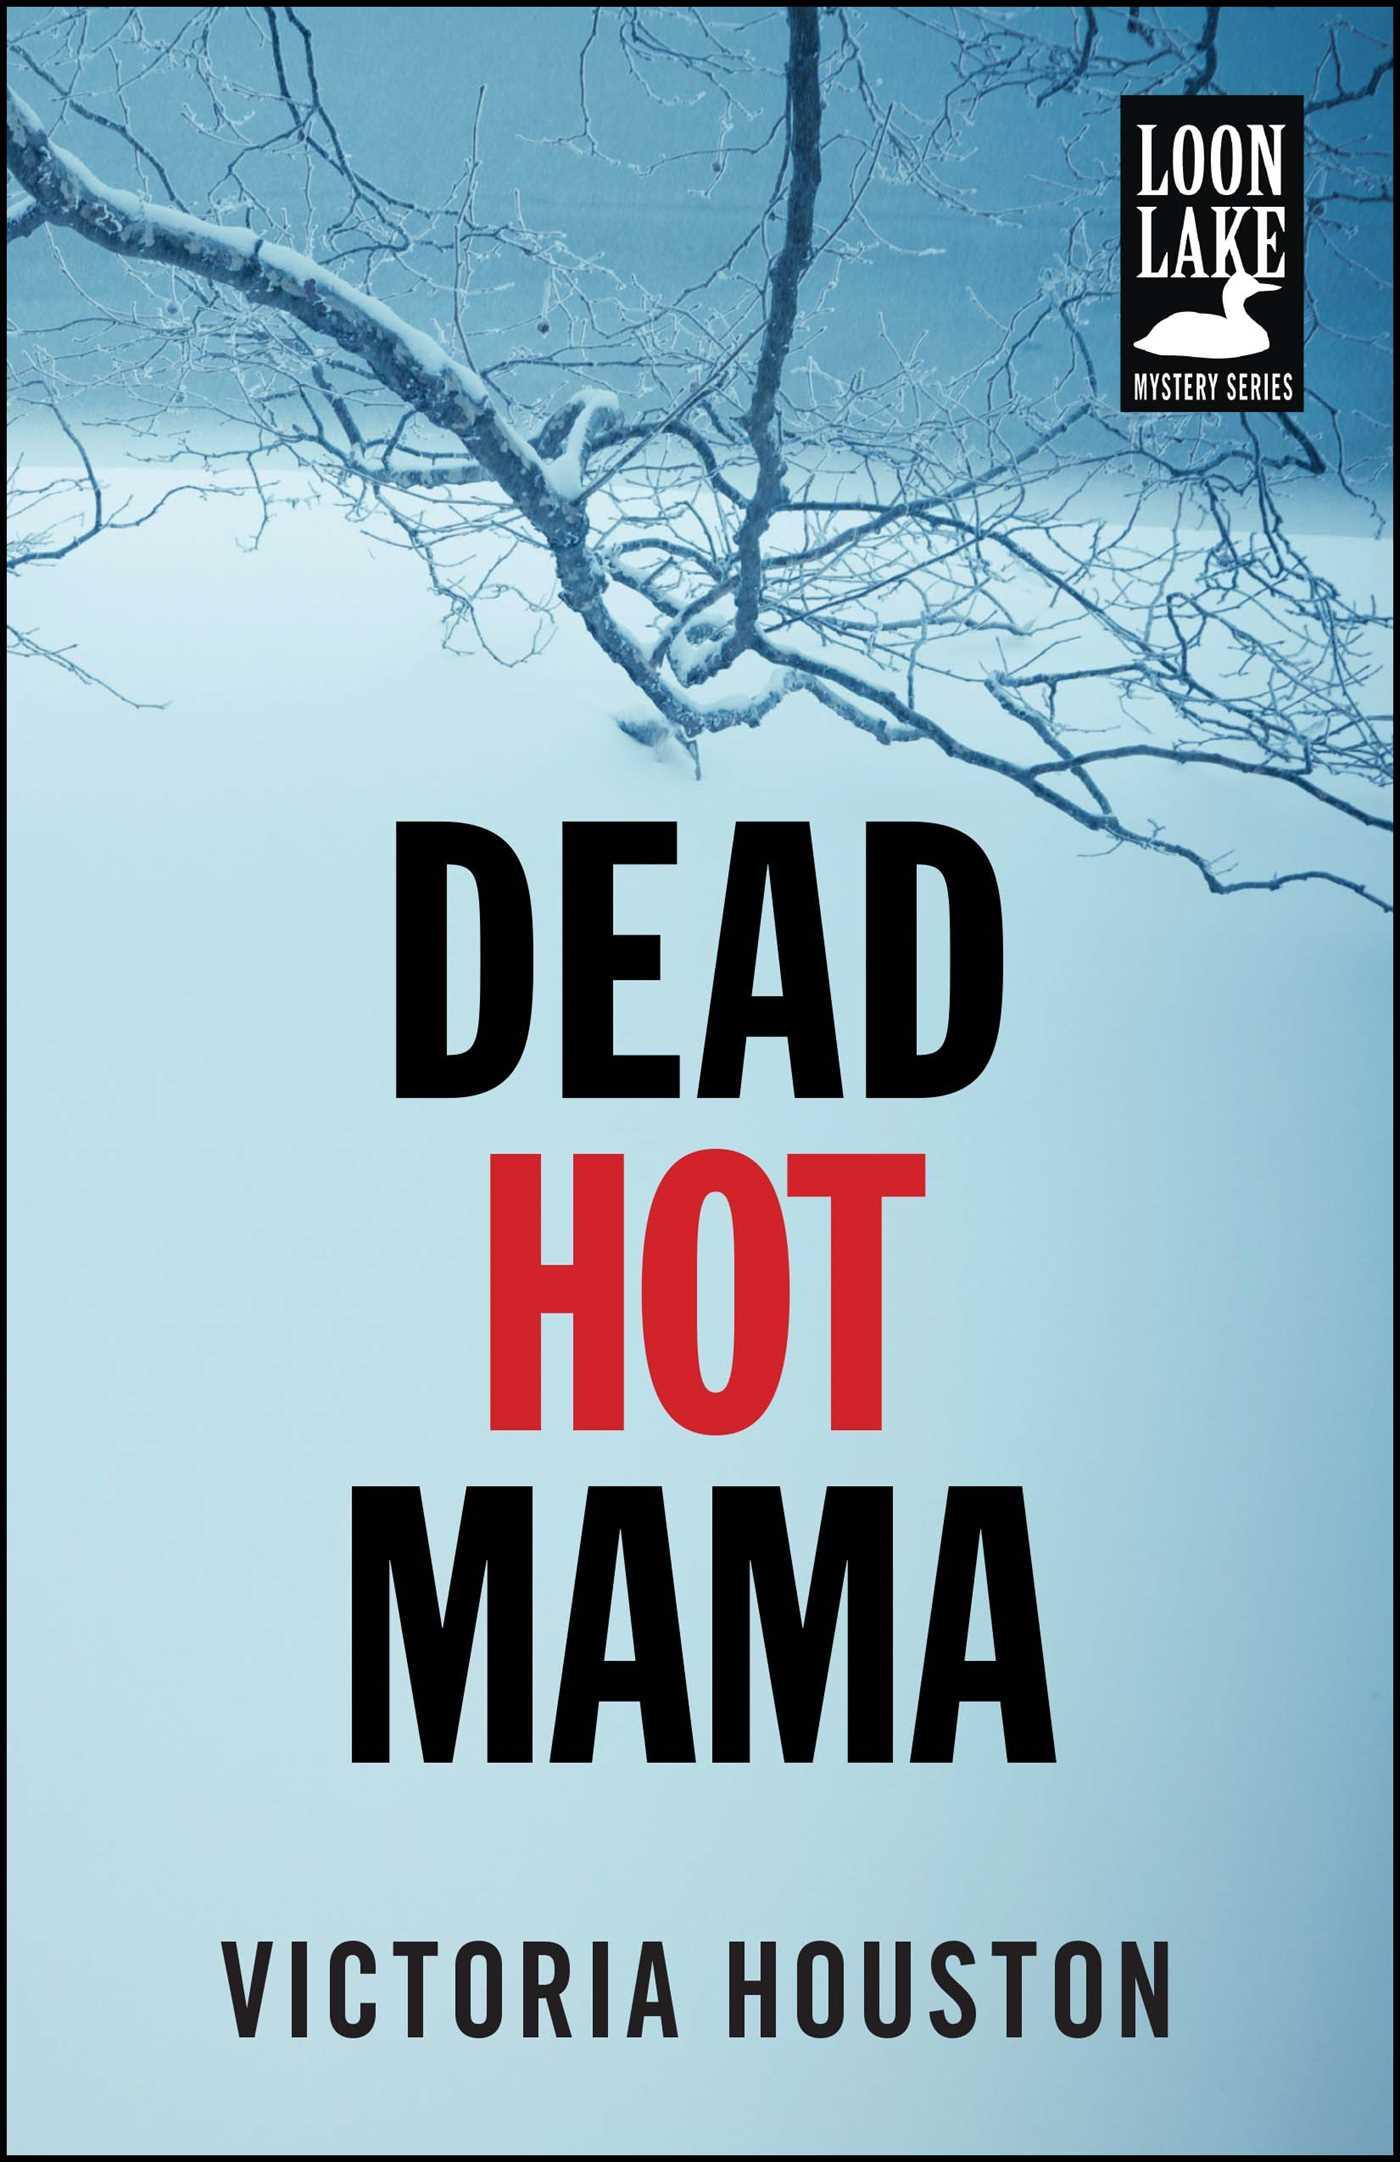 Dead hot mama 9781440531514 hr